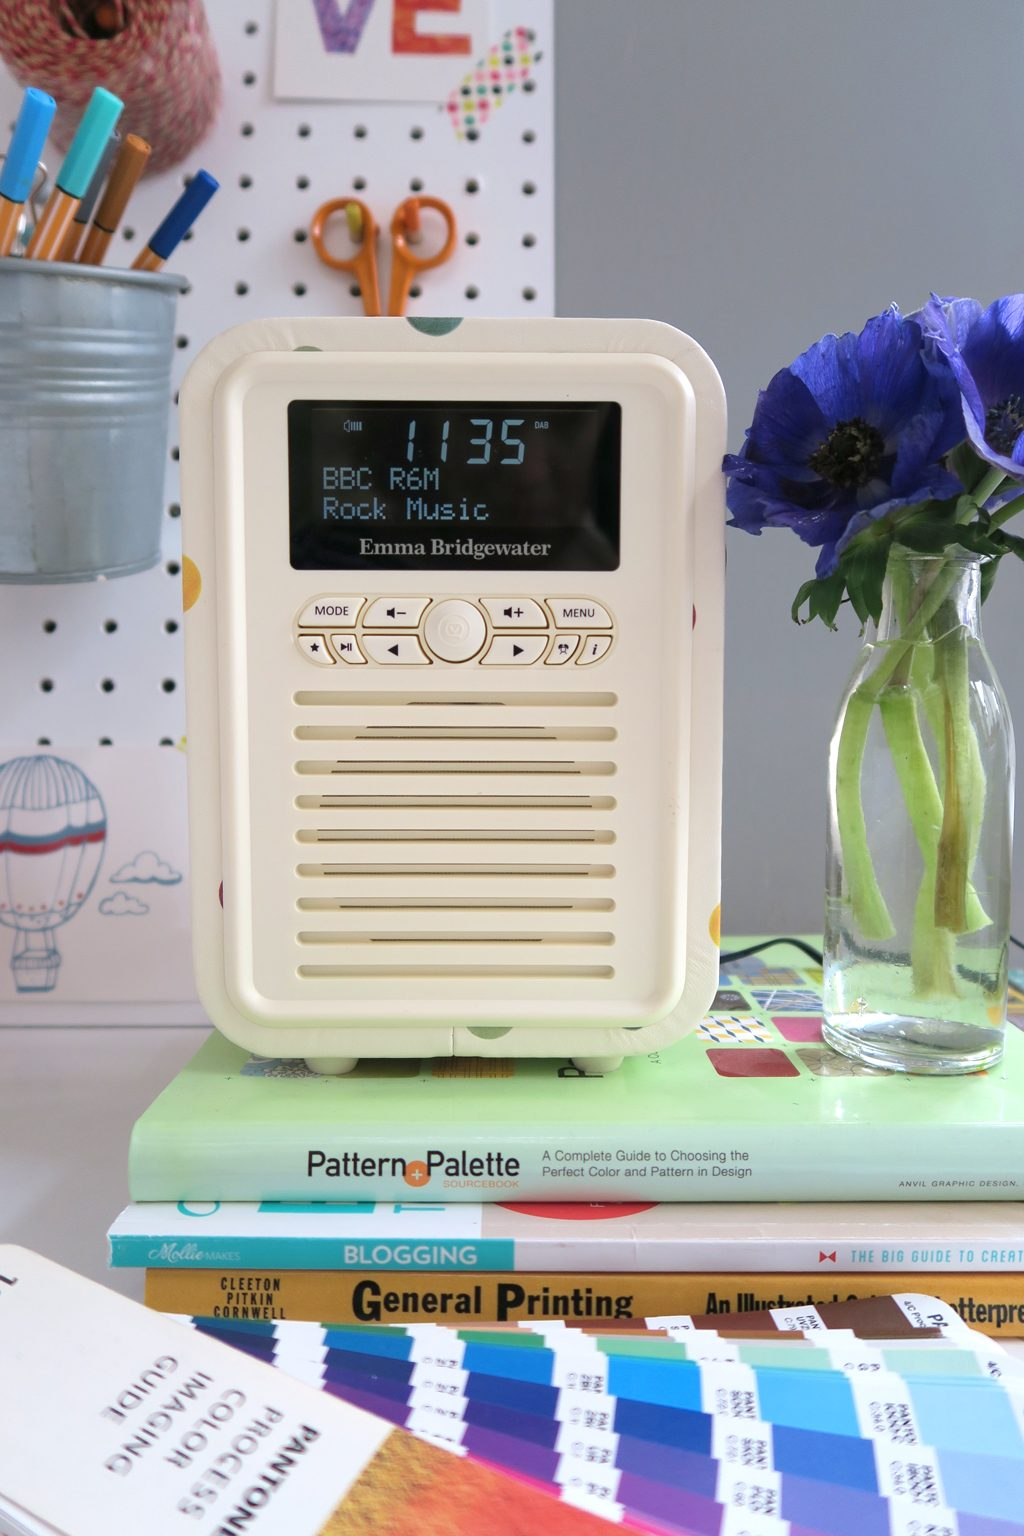 Emma Bridgewater Polkadot radio